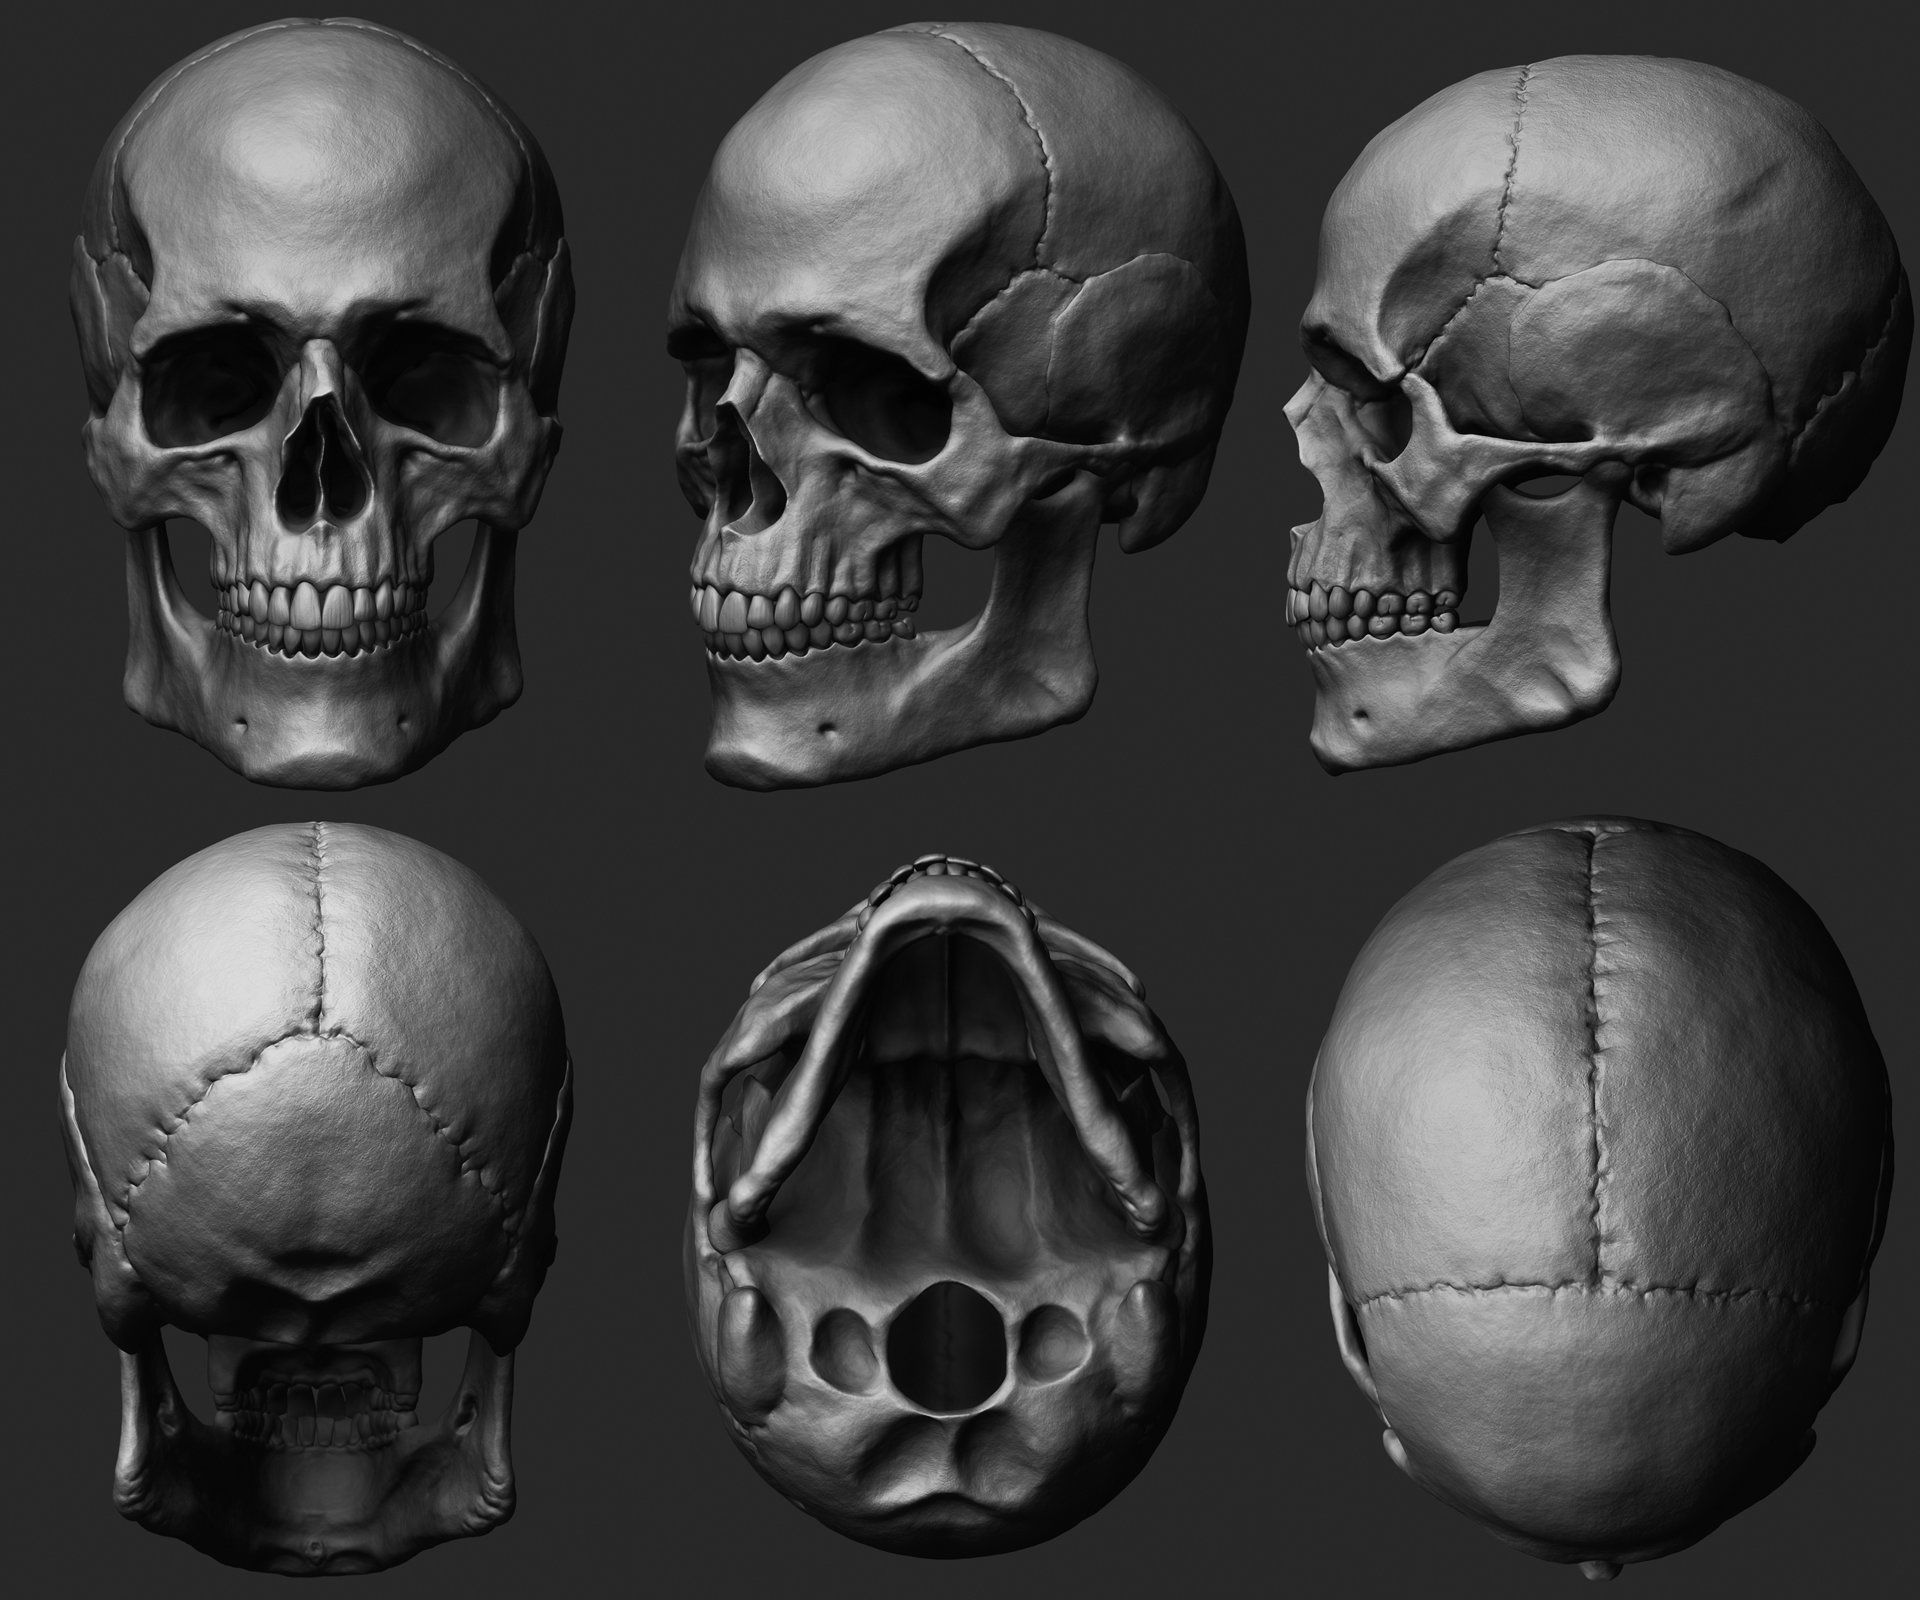 ArtStation - Skull - Anatomy Study, Marco Nogueira   Anatomy ...